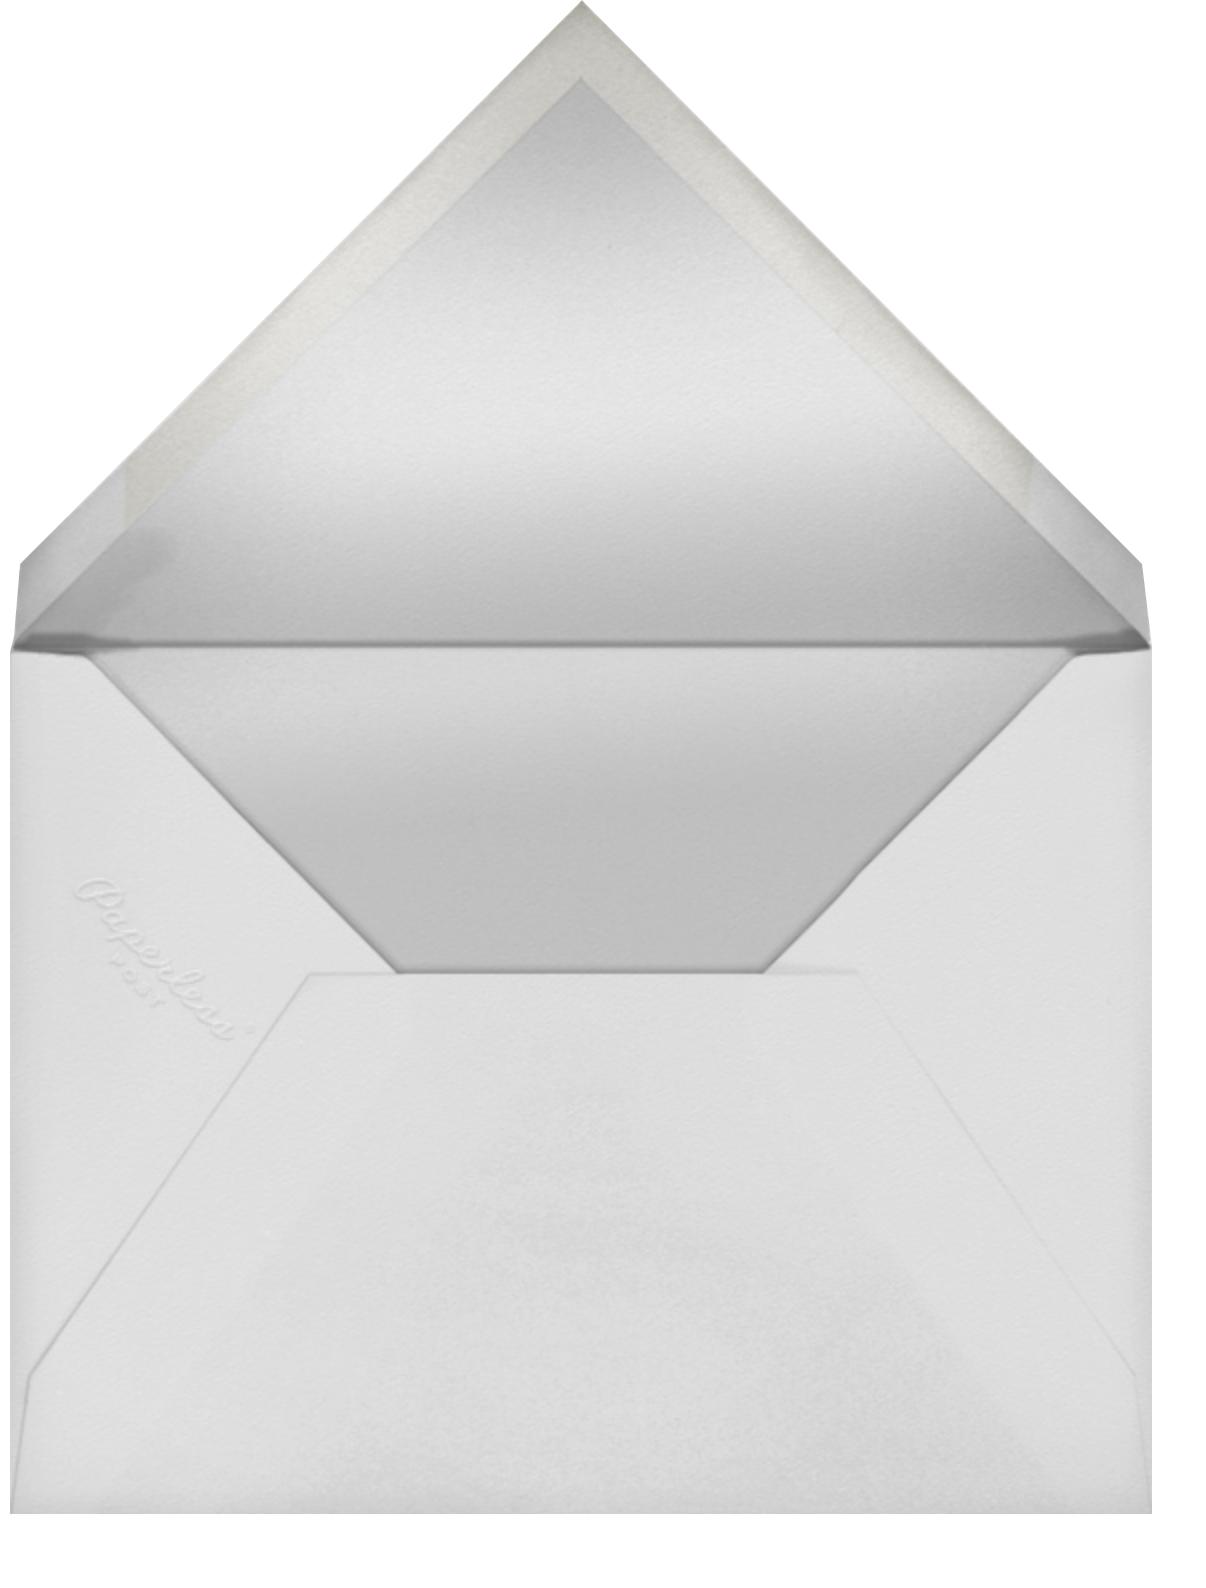 Faithful (Program) - Apricot - Paperless Post - Envelope